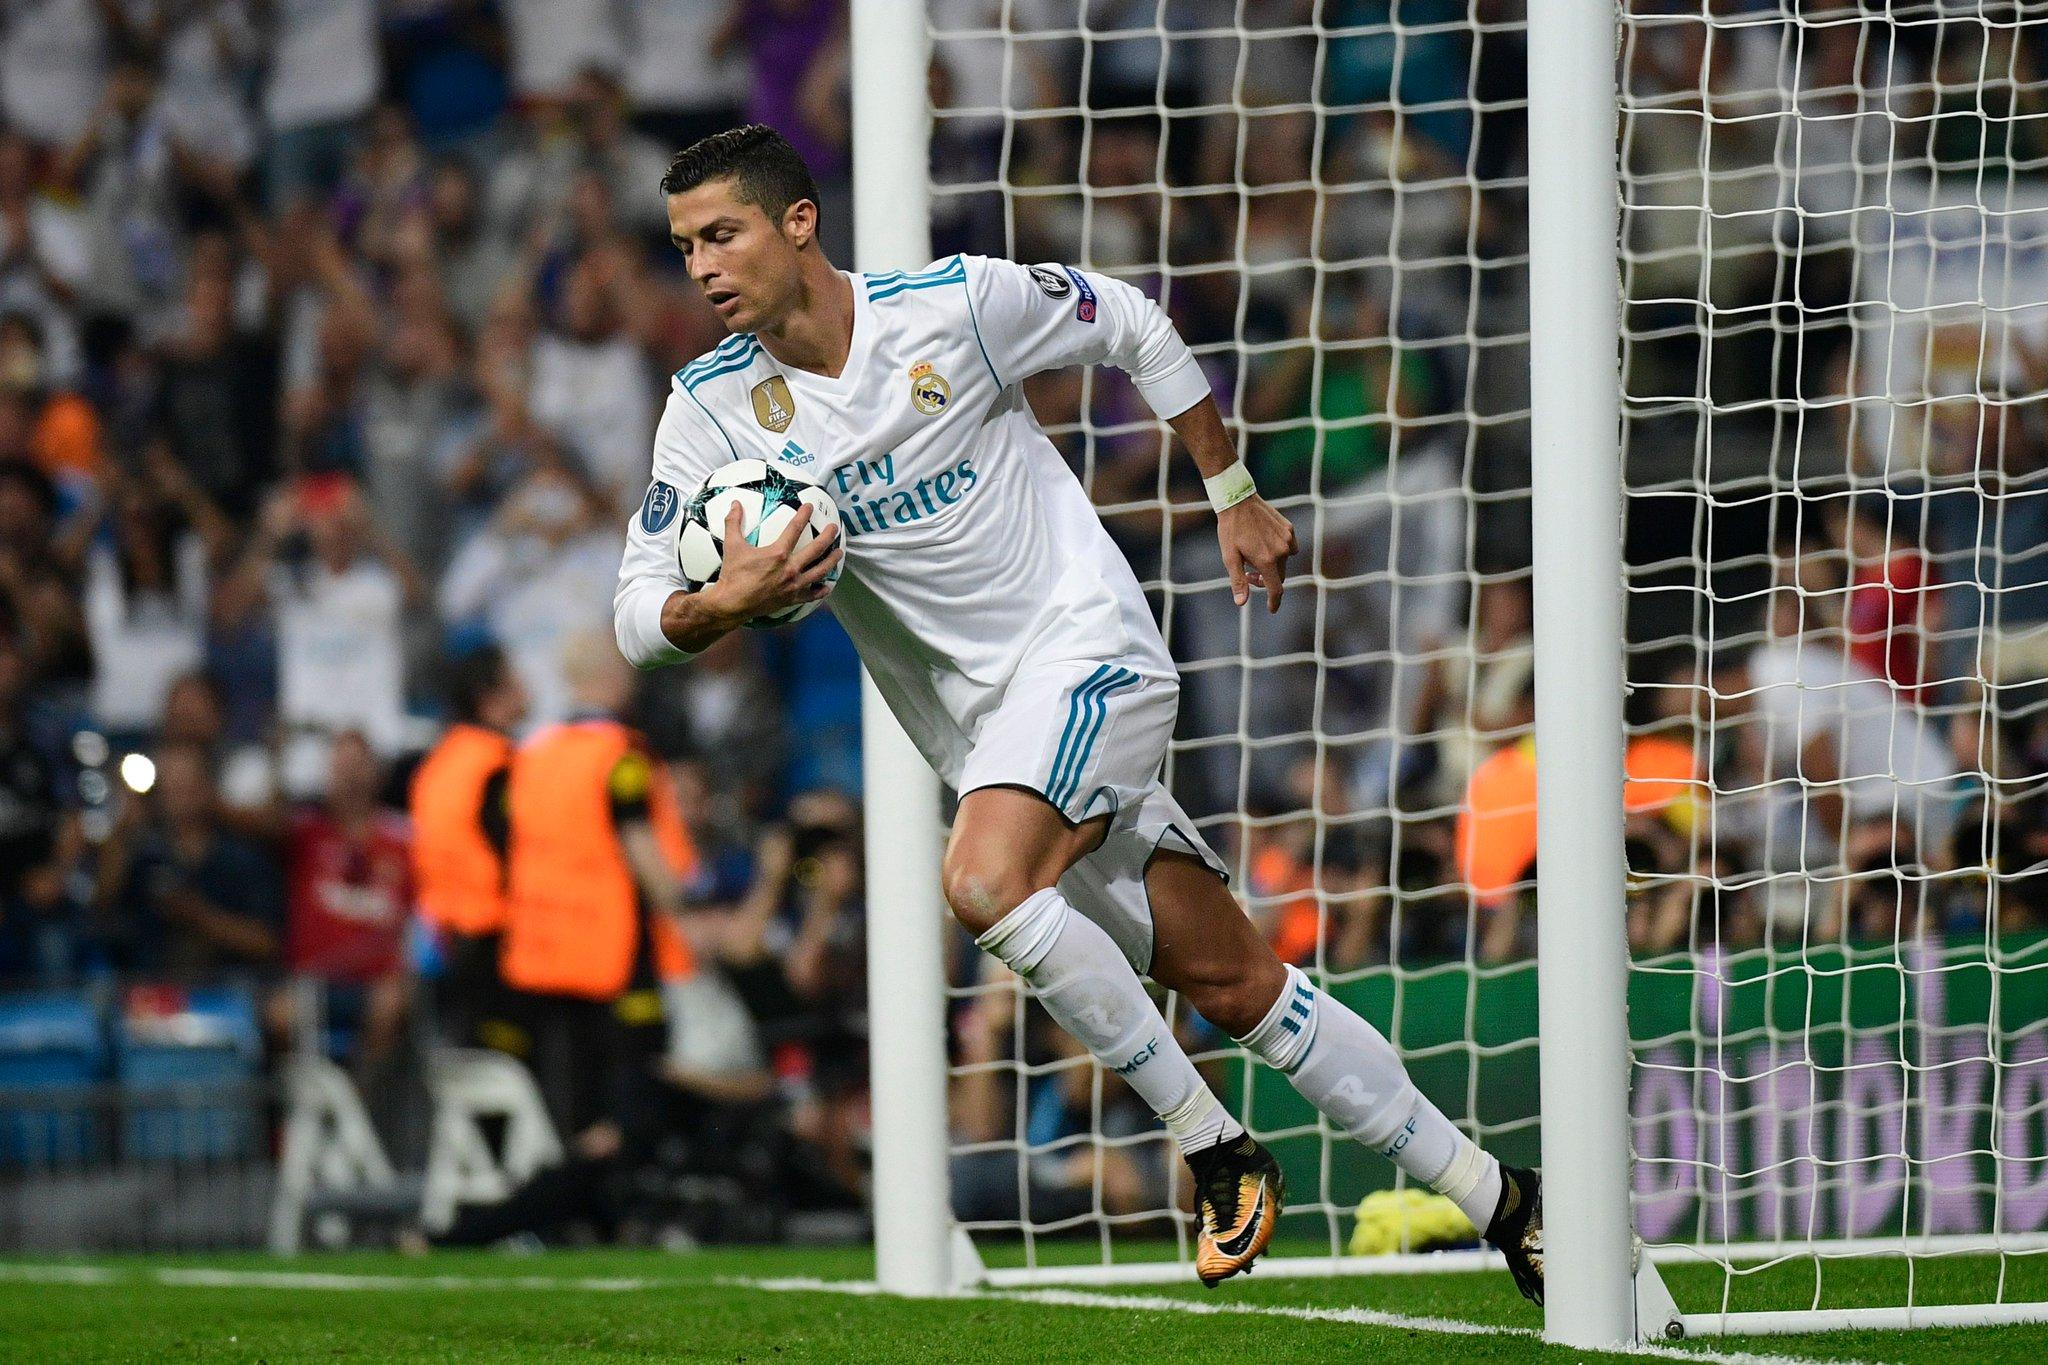 Cristiano Ronaldo has scored 9️⃣2️⃣ goals in 8️⃣9️⃣ #UCL games for Real Madrid. �� https://t.co/2WSagGjAiL